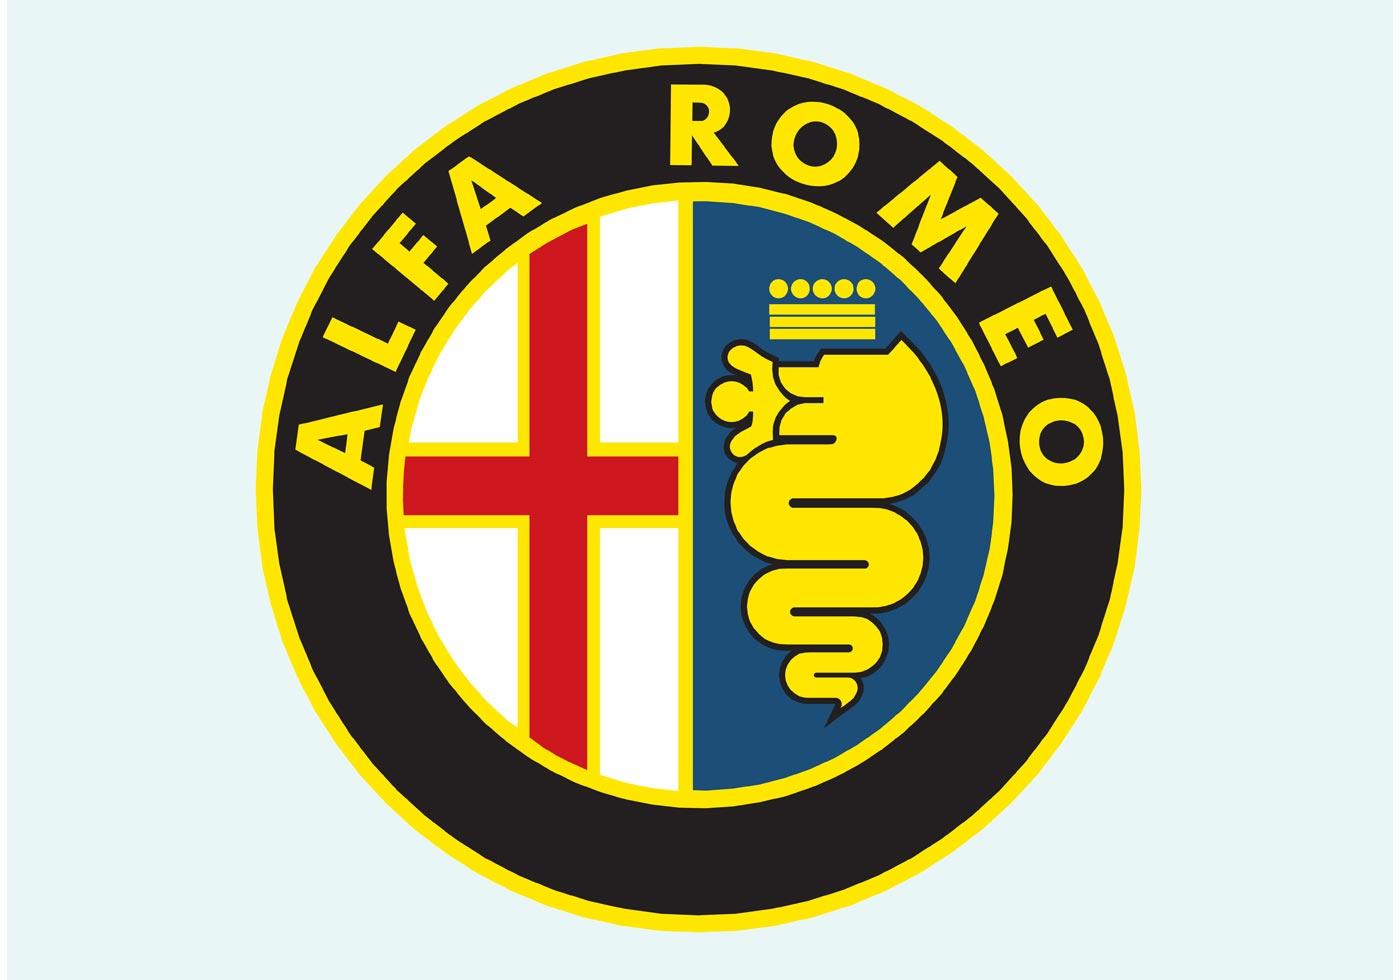 alfa romeo disc logo download free vector art stock graphics images. Black Bedroom Furniture Sets. Home Design Ideas